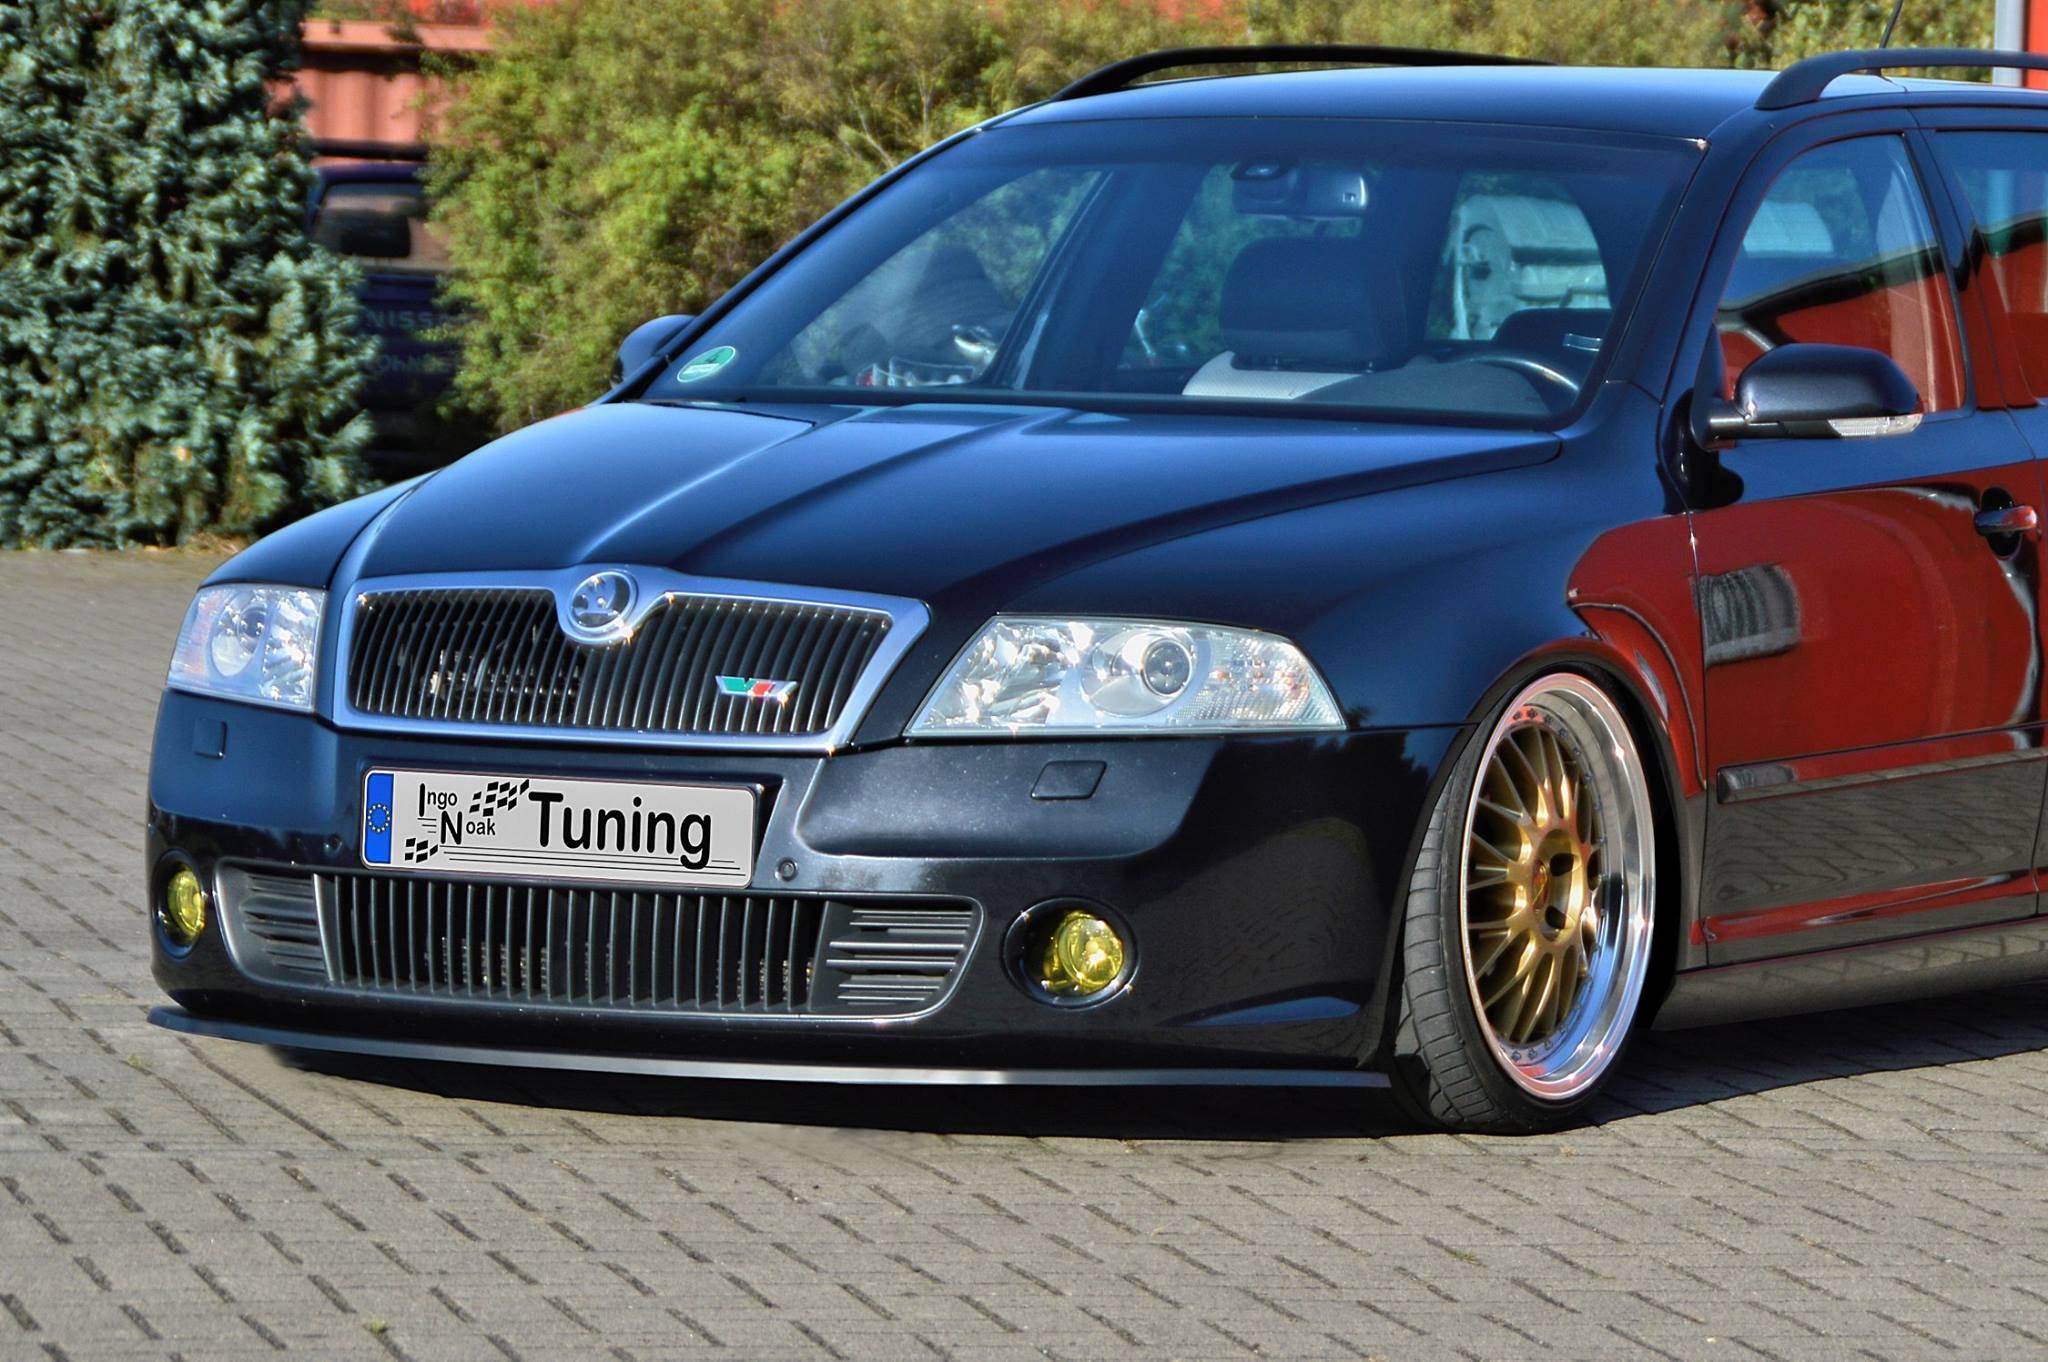 Ingo Noak Custom Splitters Match Every Skoda Rs And Opel